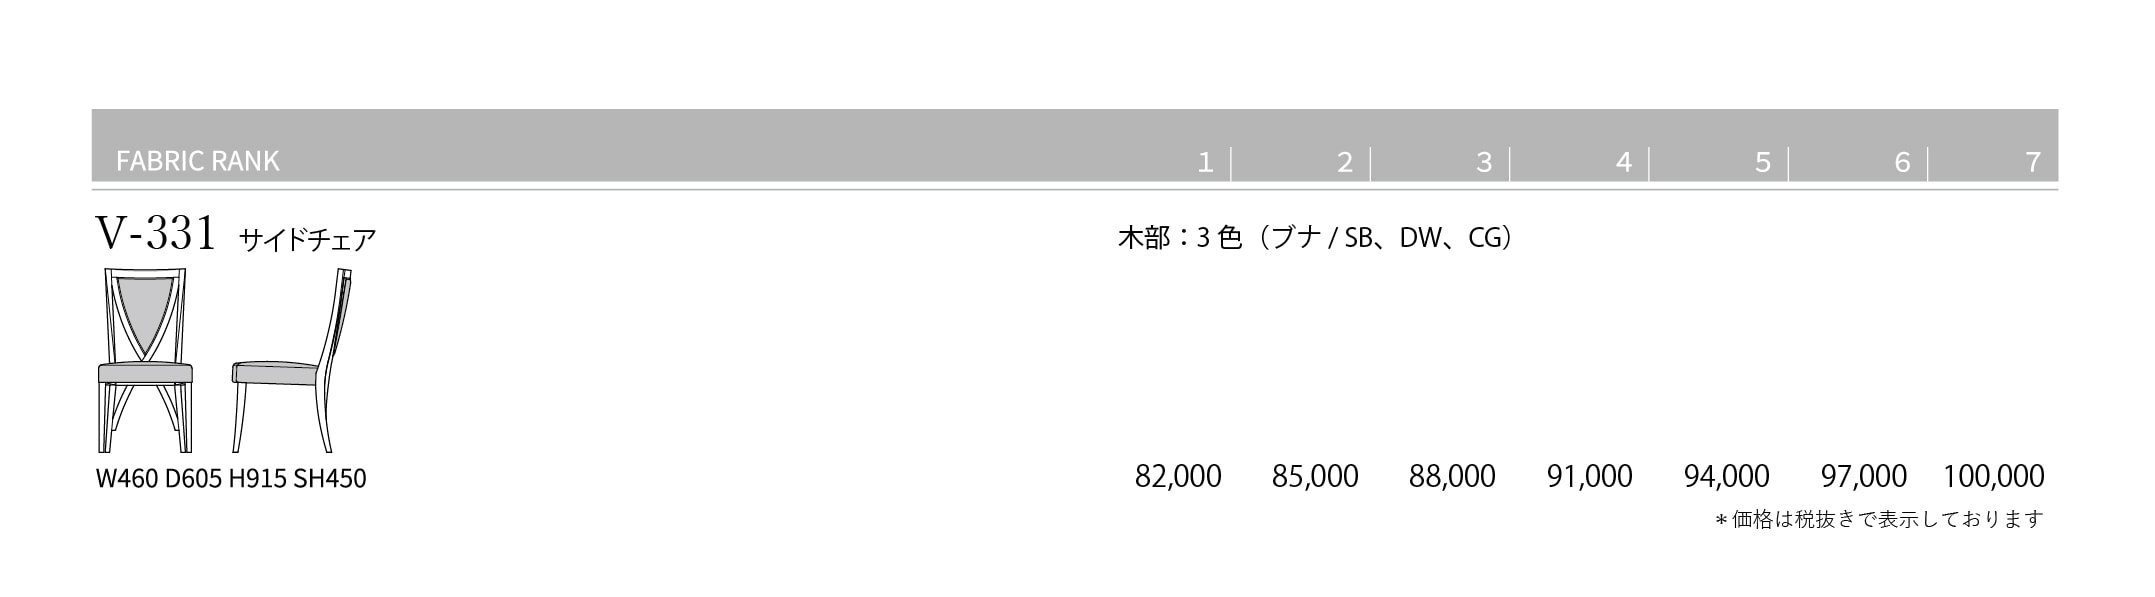 V-331 Price List